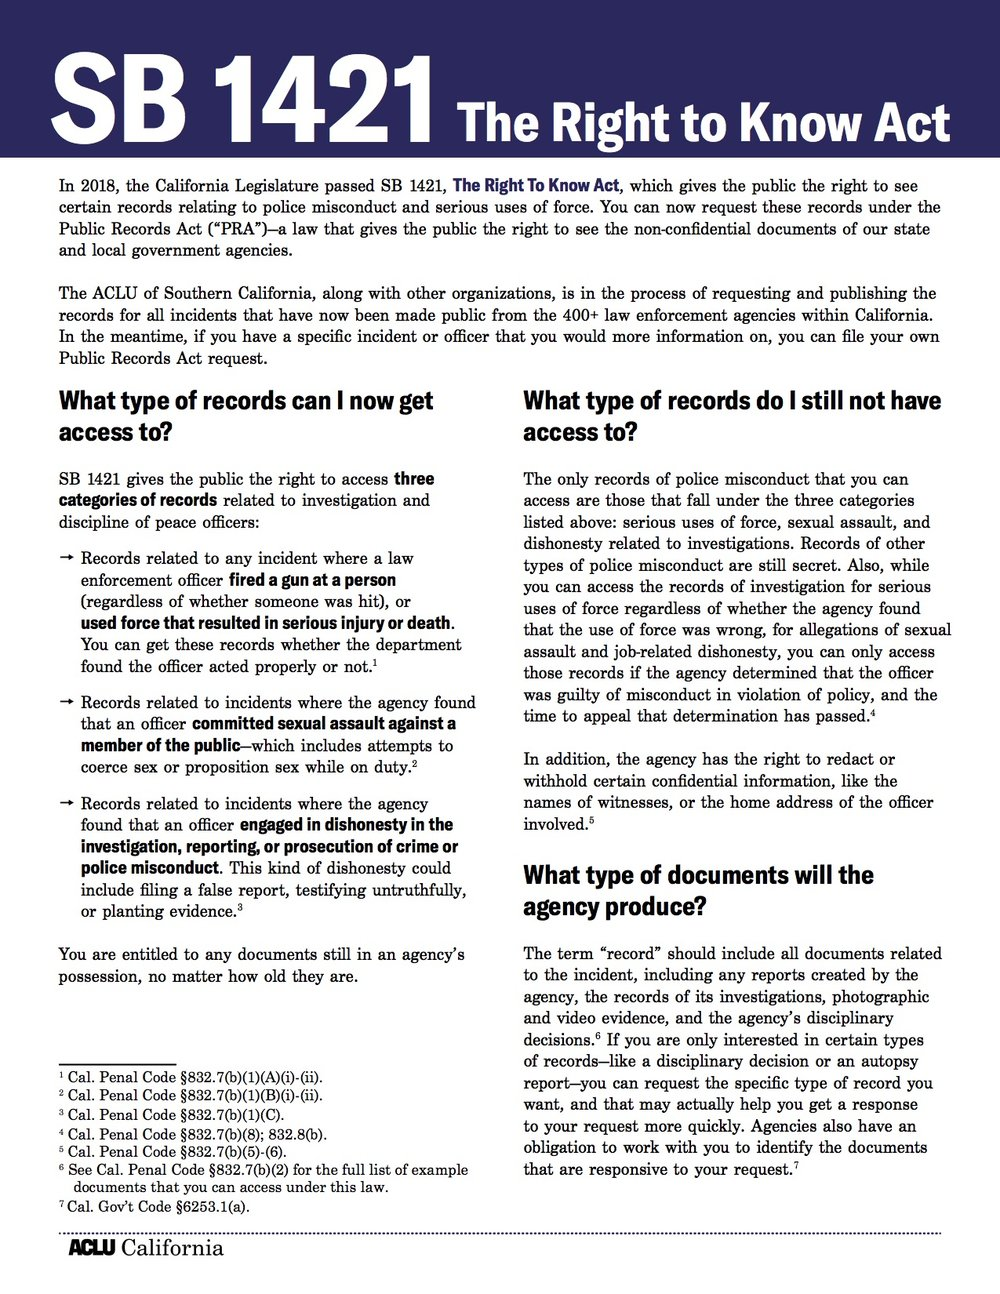 aclu_socal_sb1421 pg 1.jpg